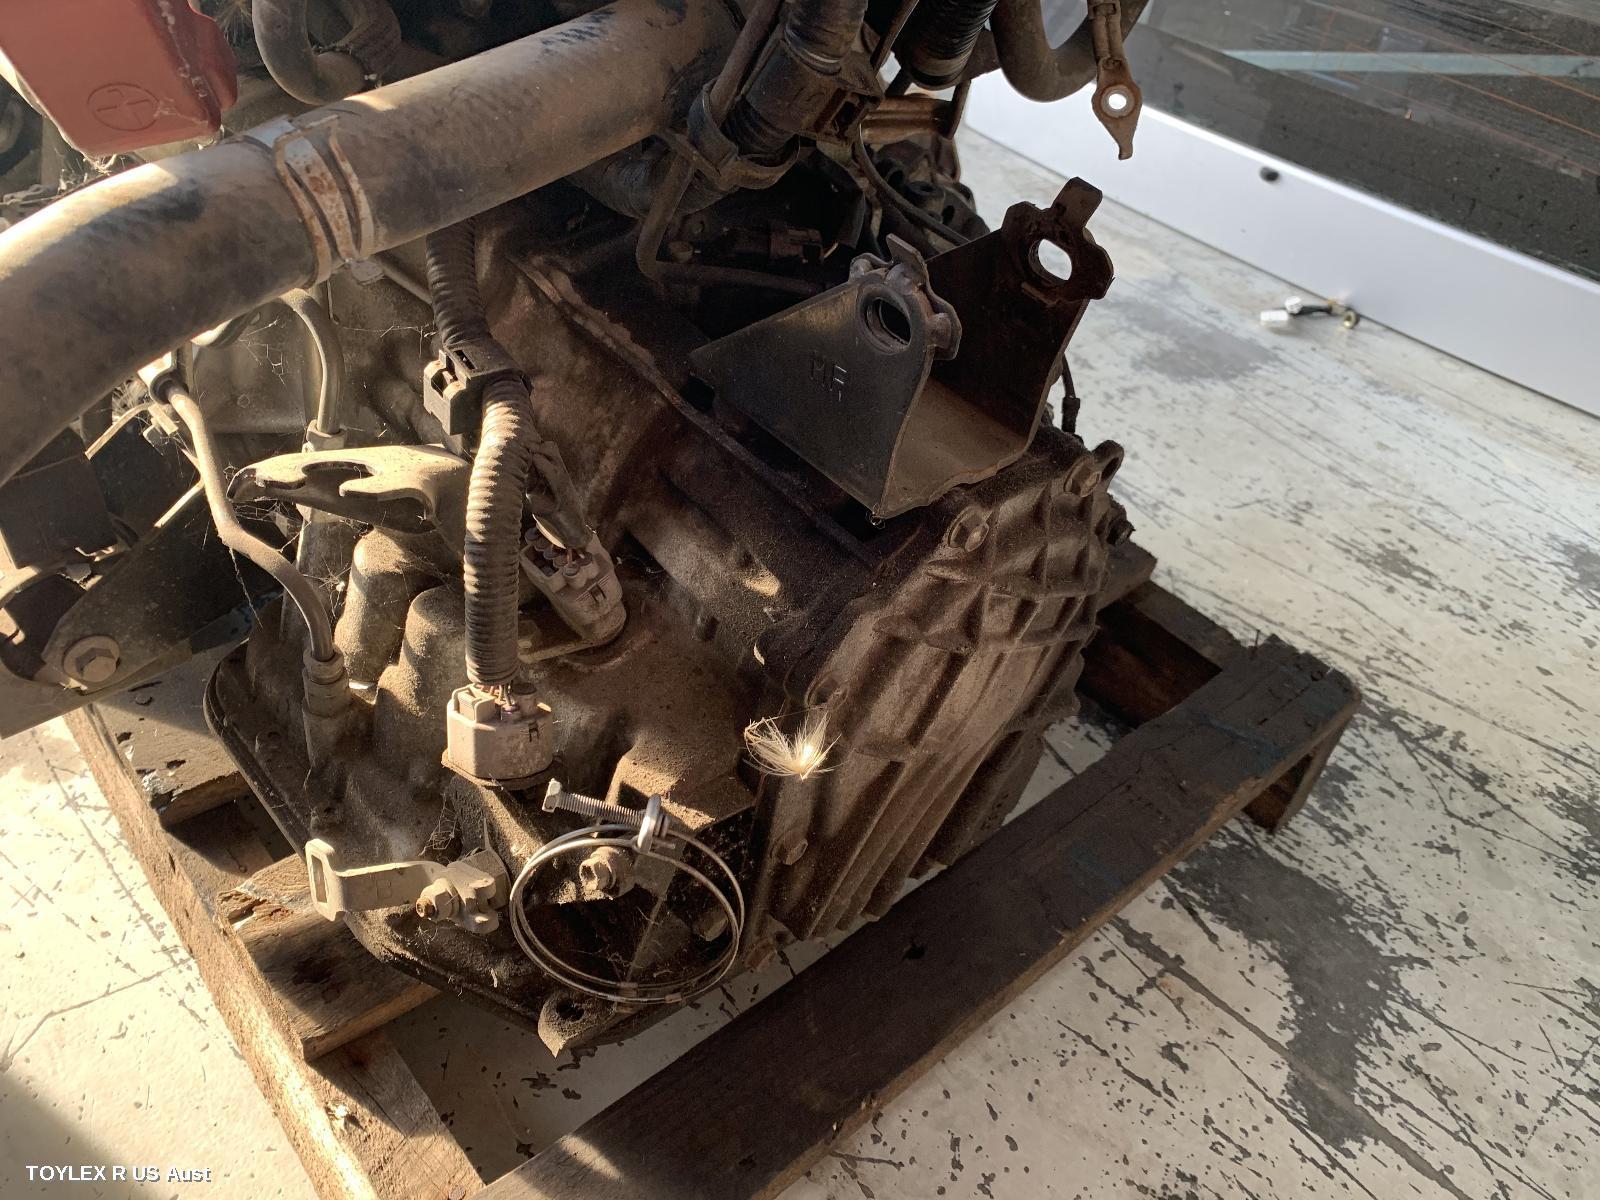 TOYOTA COROLLA, Trans/Gearbox, AUTO, FWD, PETROL, 1.8, 1ZZ-FE, U341E CODE, ZZE122, 04/04-06/07